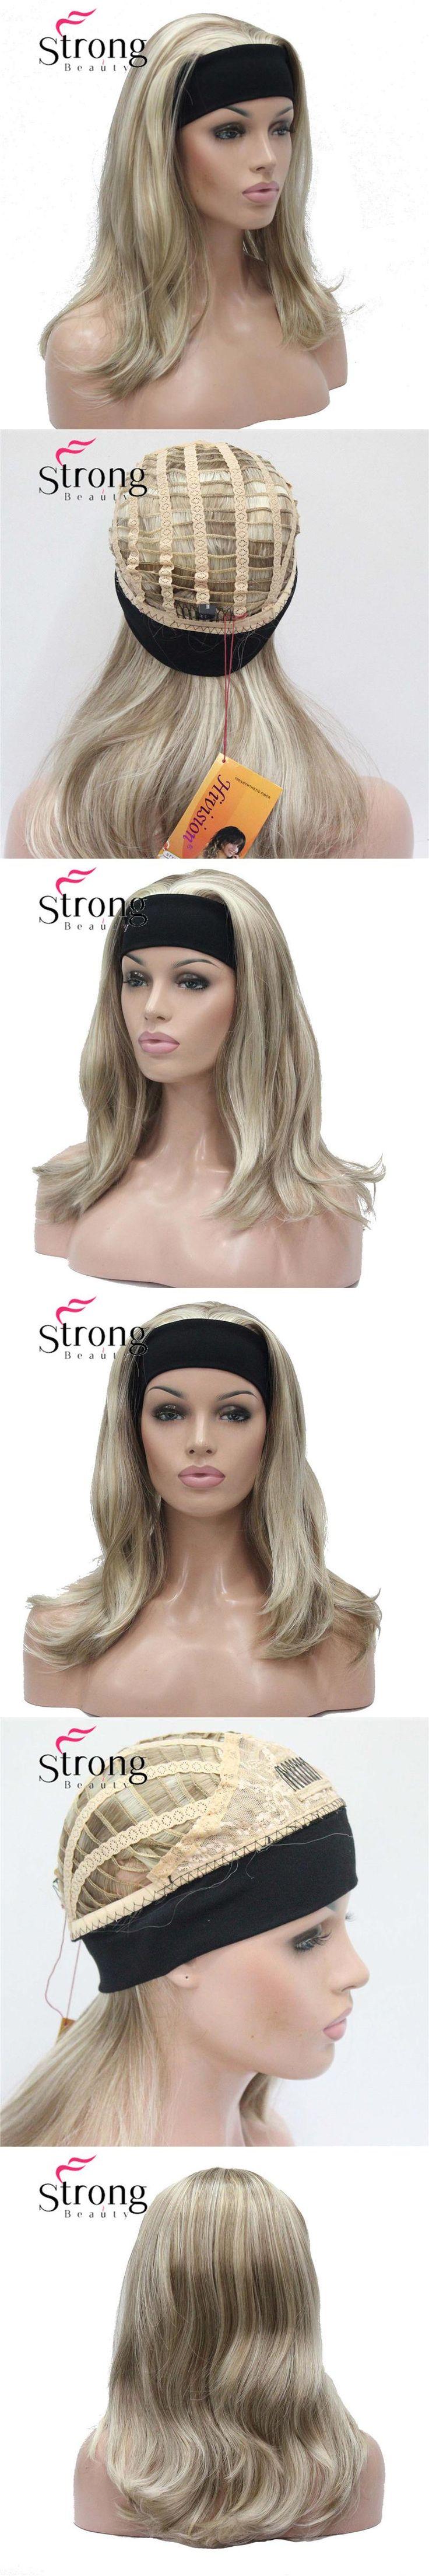 StrongBeauty Medium Blonde Highlights Natural Slight Waves Heat Ok Synthetic HEADBAND Wig